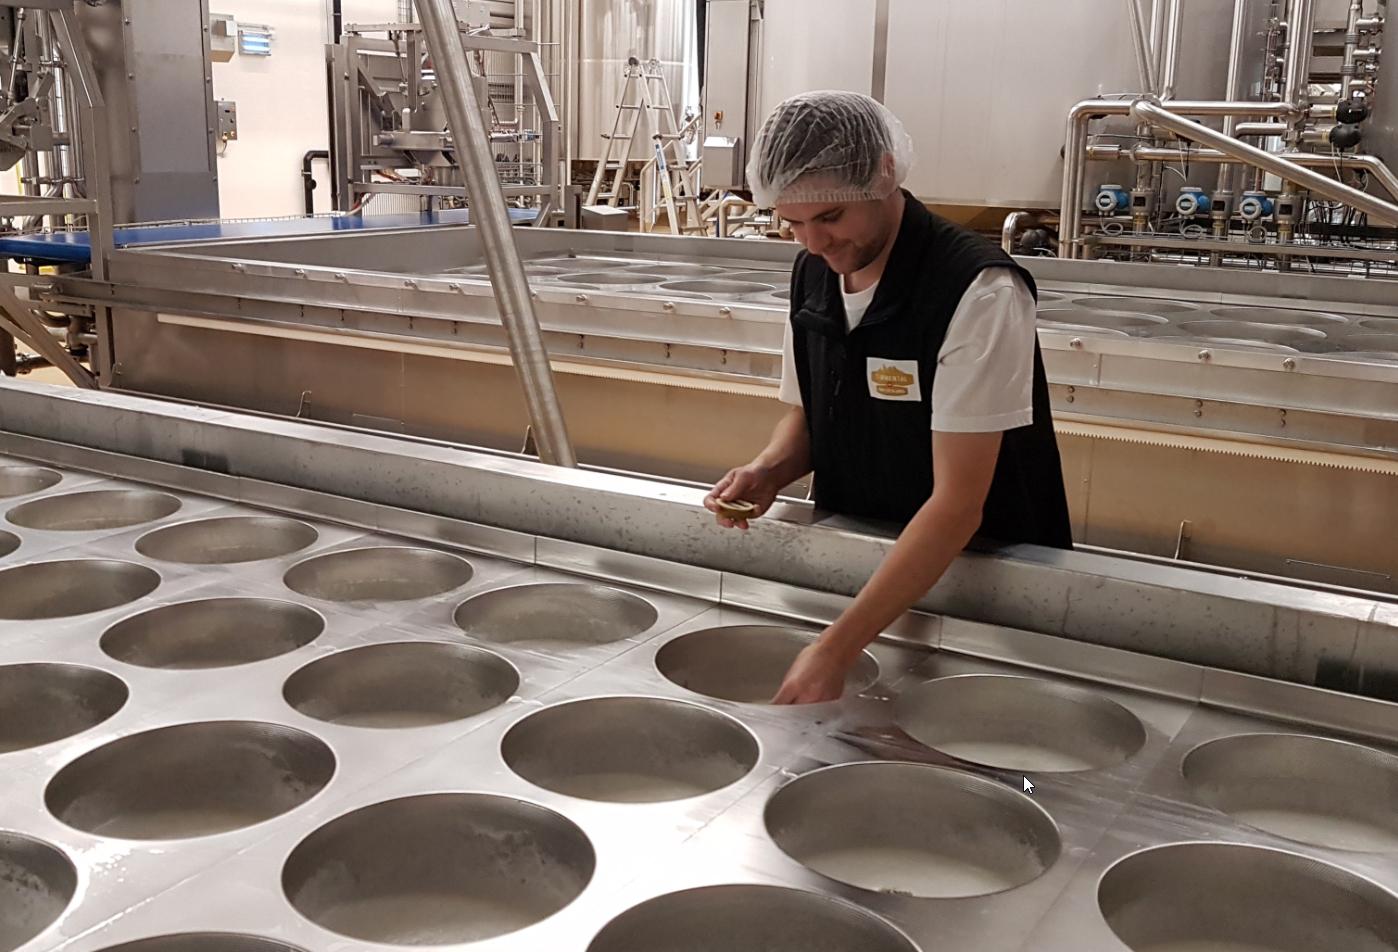 Einblick in die Käseproduktion